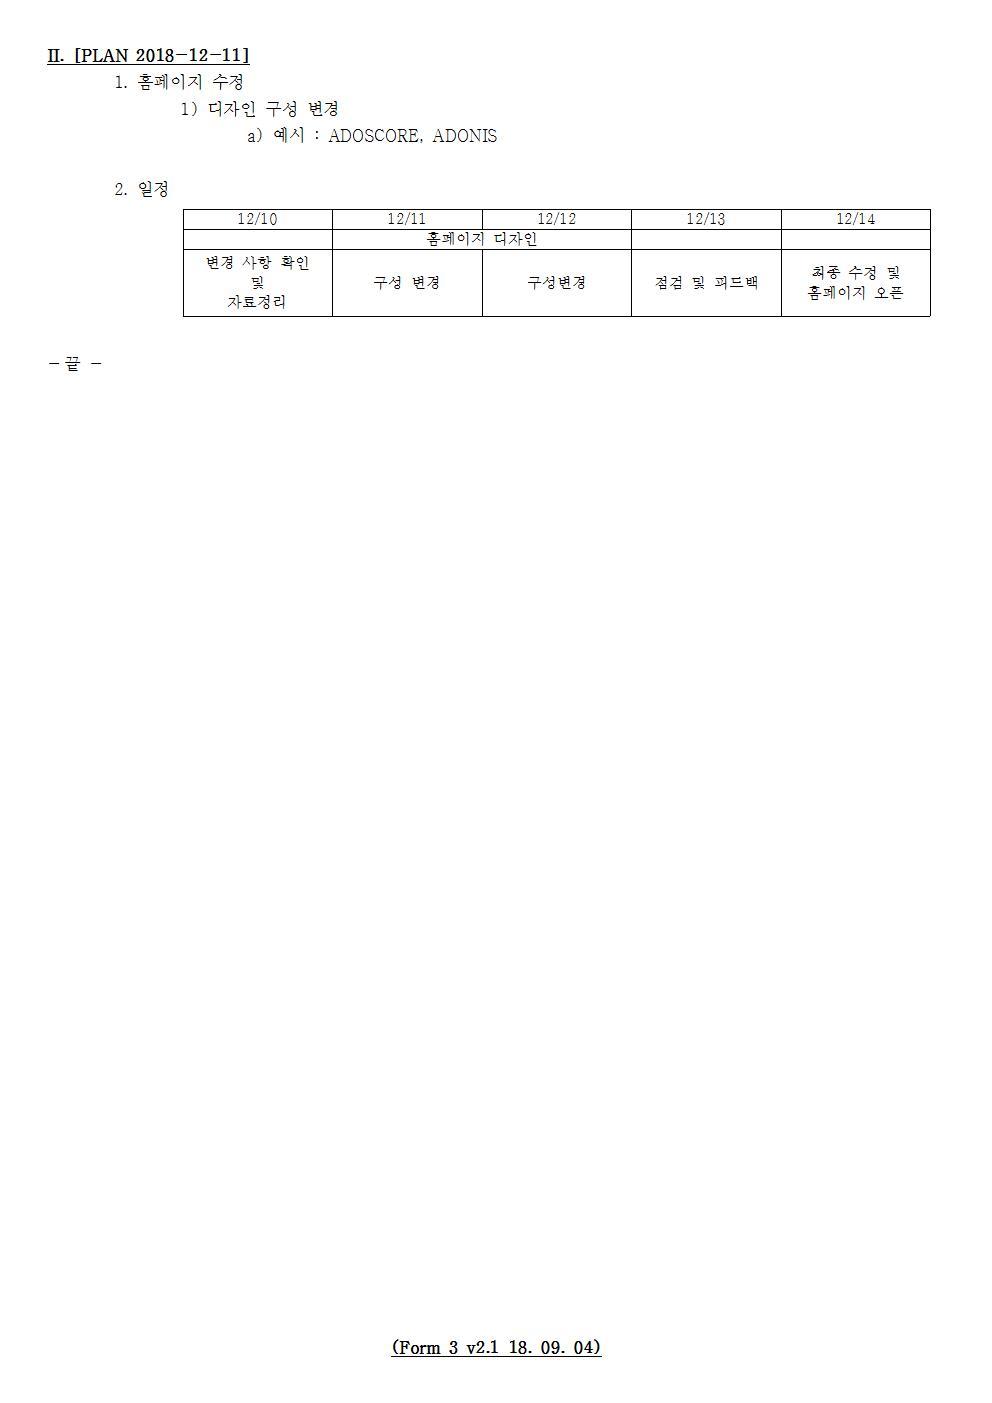 D-[18-047-BZ-07]-[BZEN HP v3.0]-[2018-12-11][HH]002.jpg